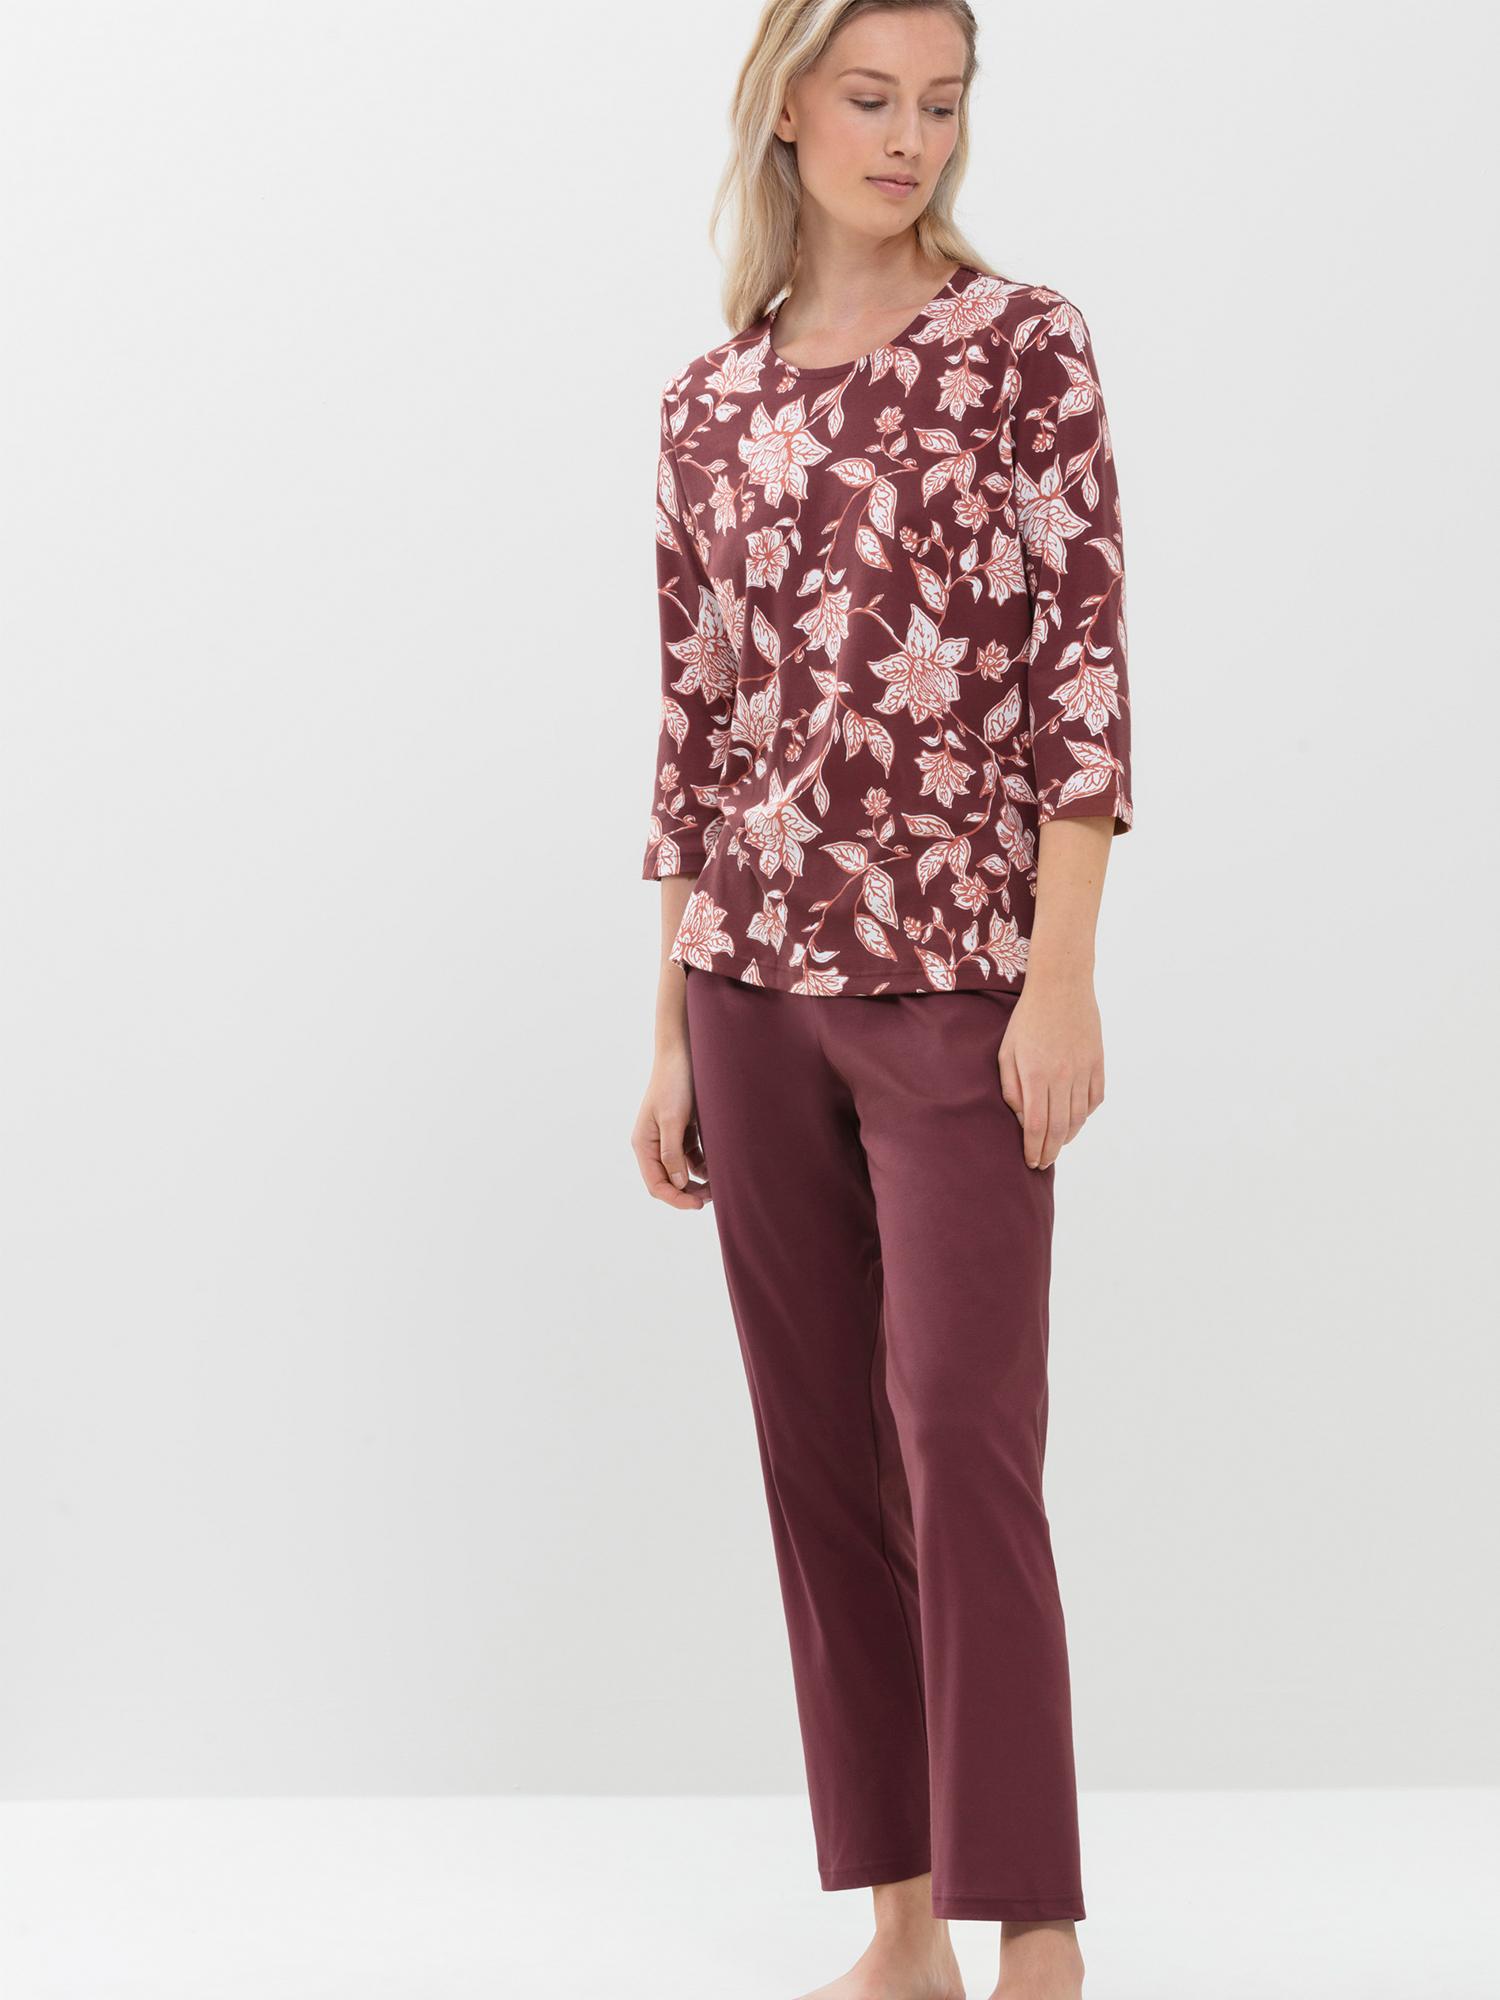 7/8 Pyjamas für Damen | mey®